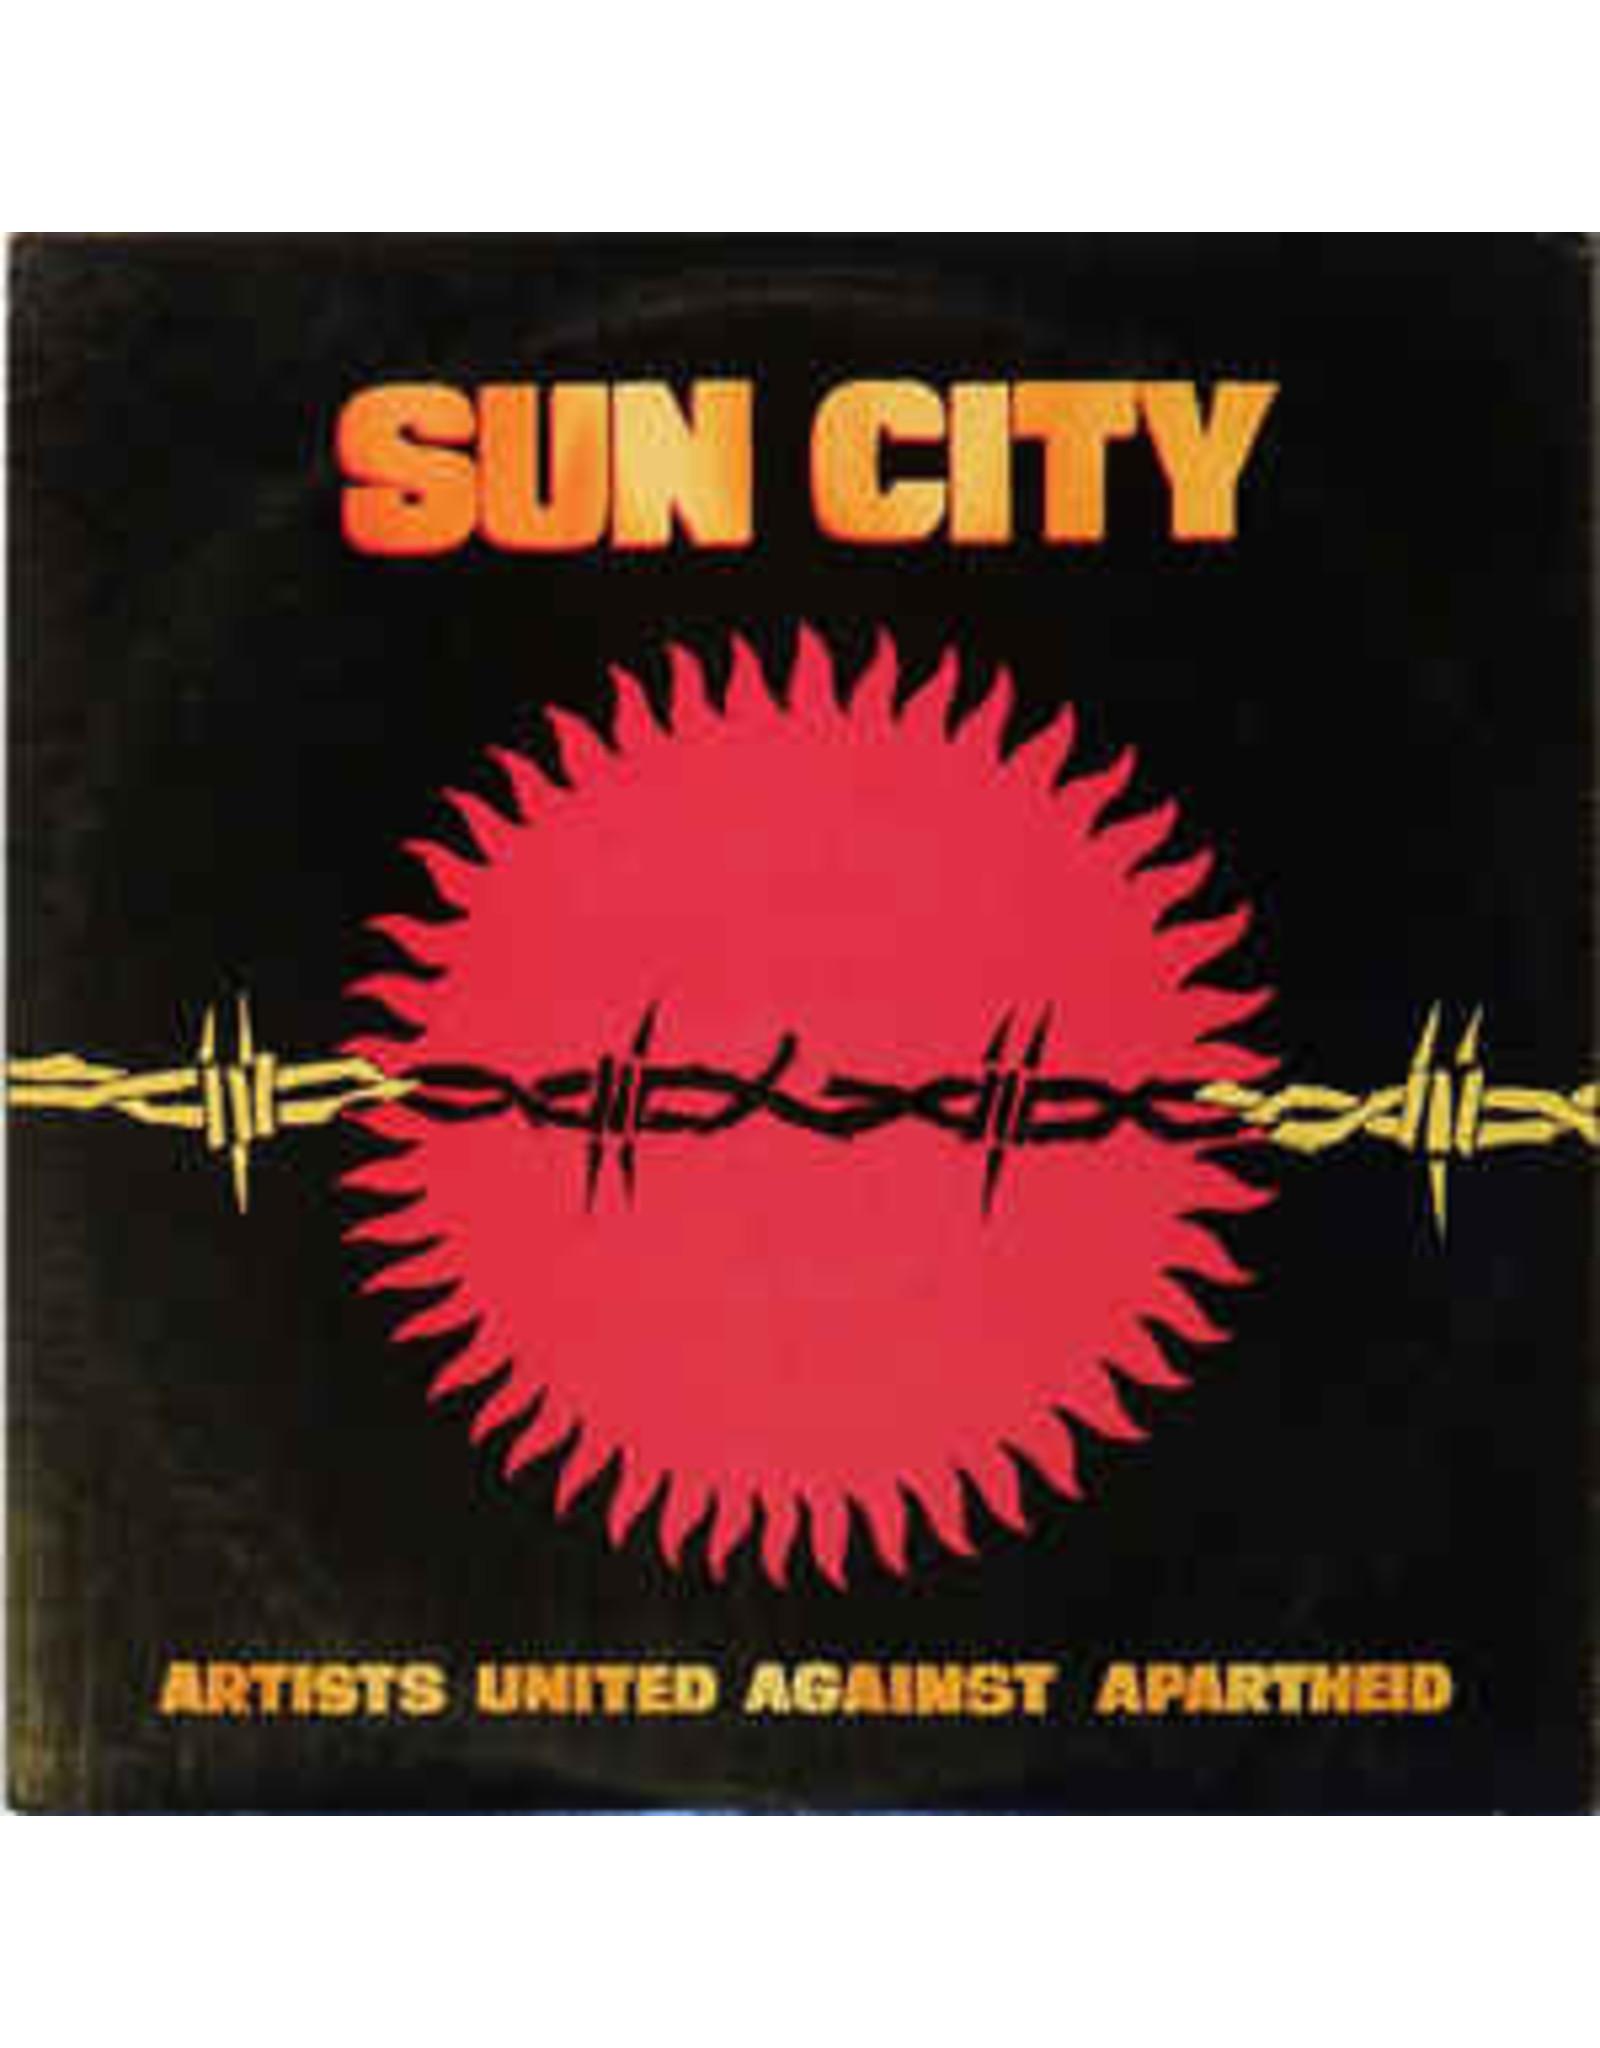 Artists United Against Apartheid / Sun City